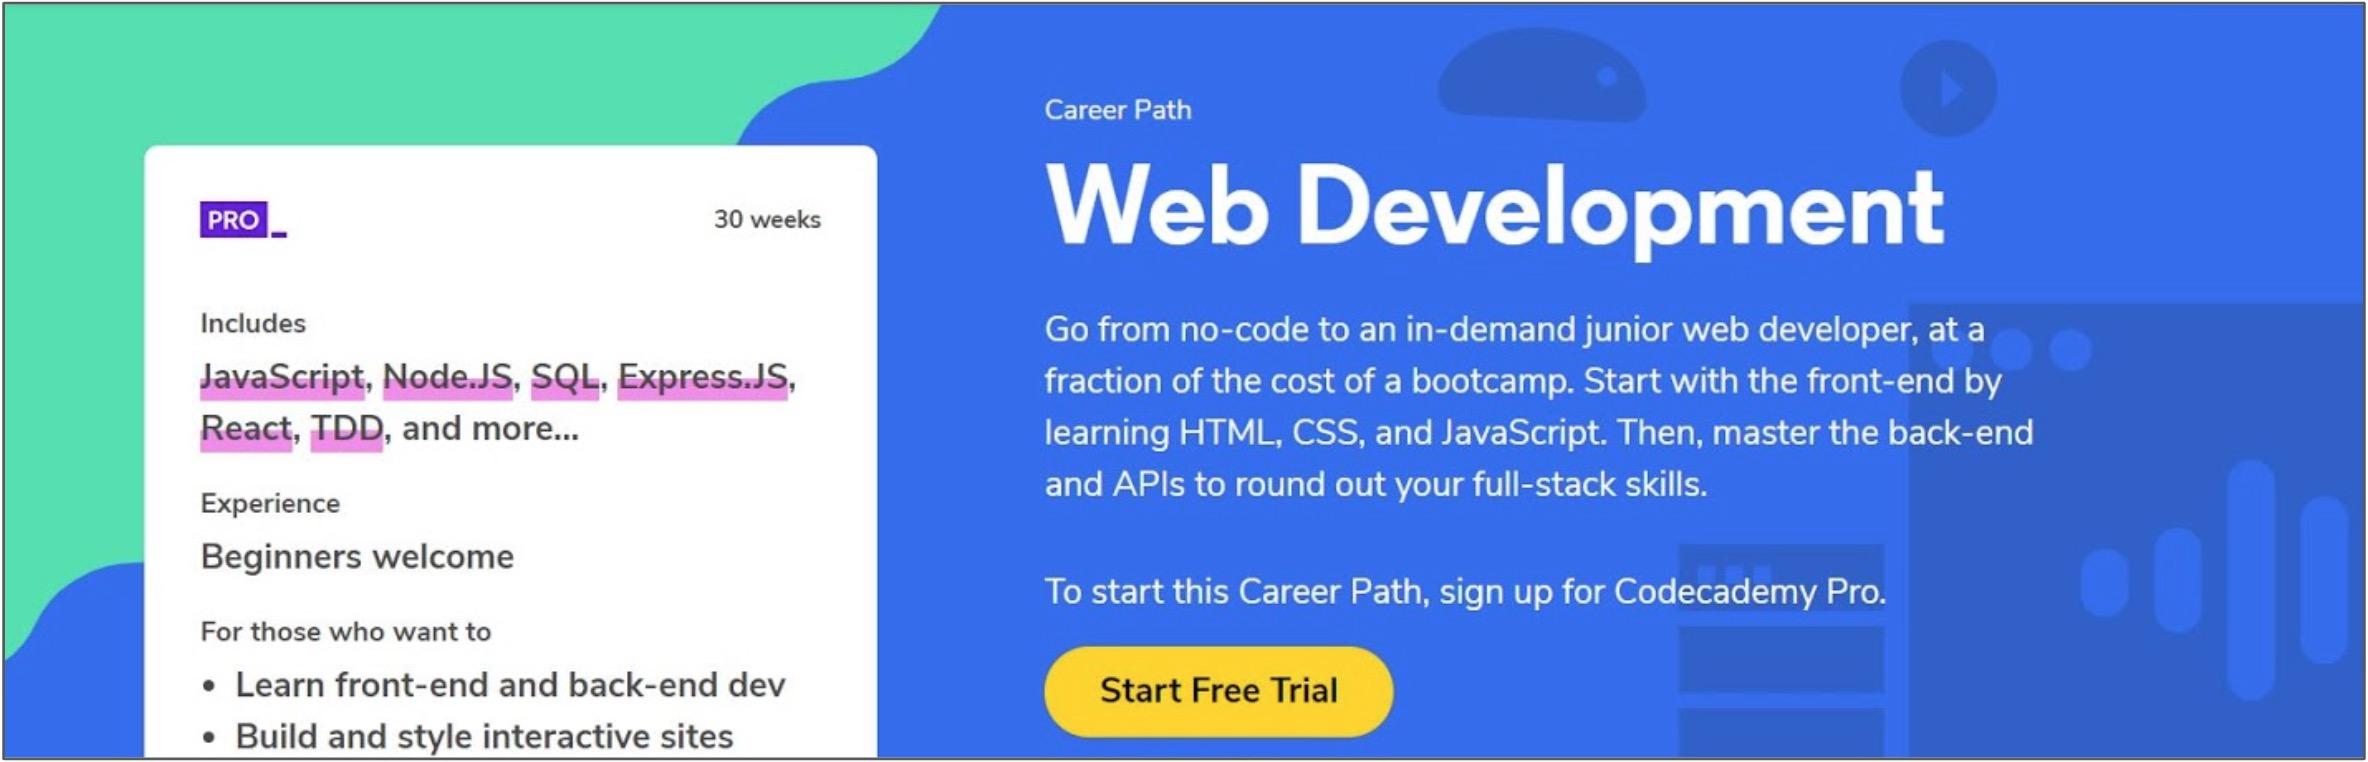 Screenshot of a Web Development course on Codecademy